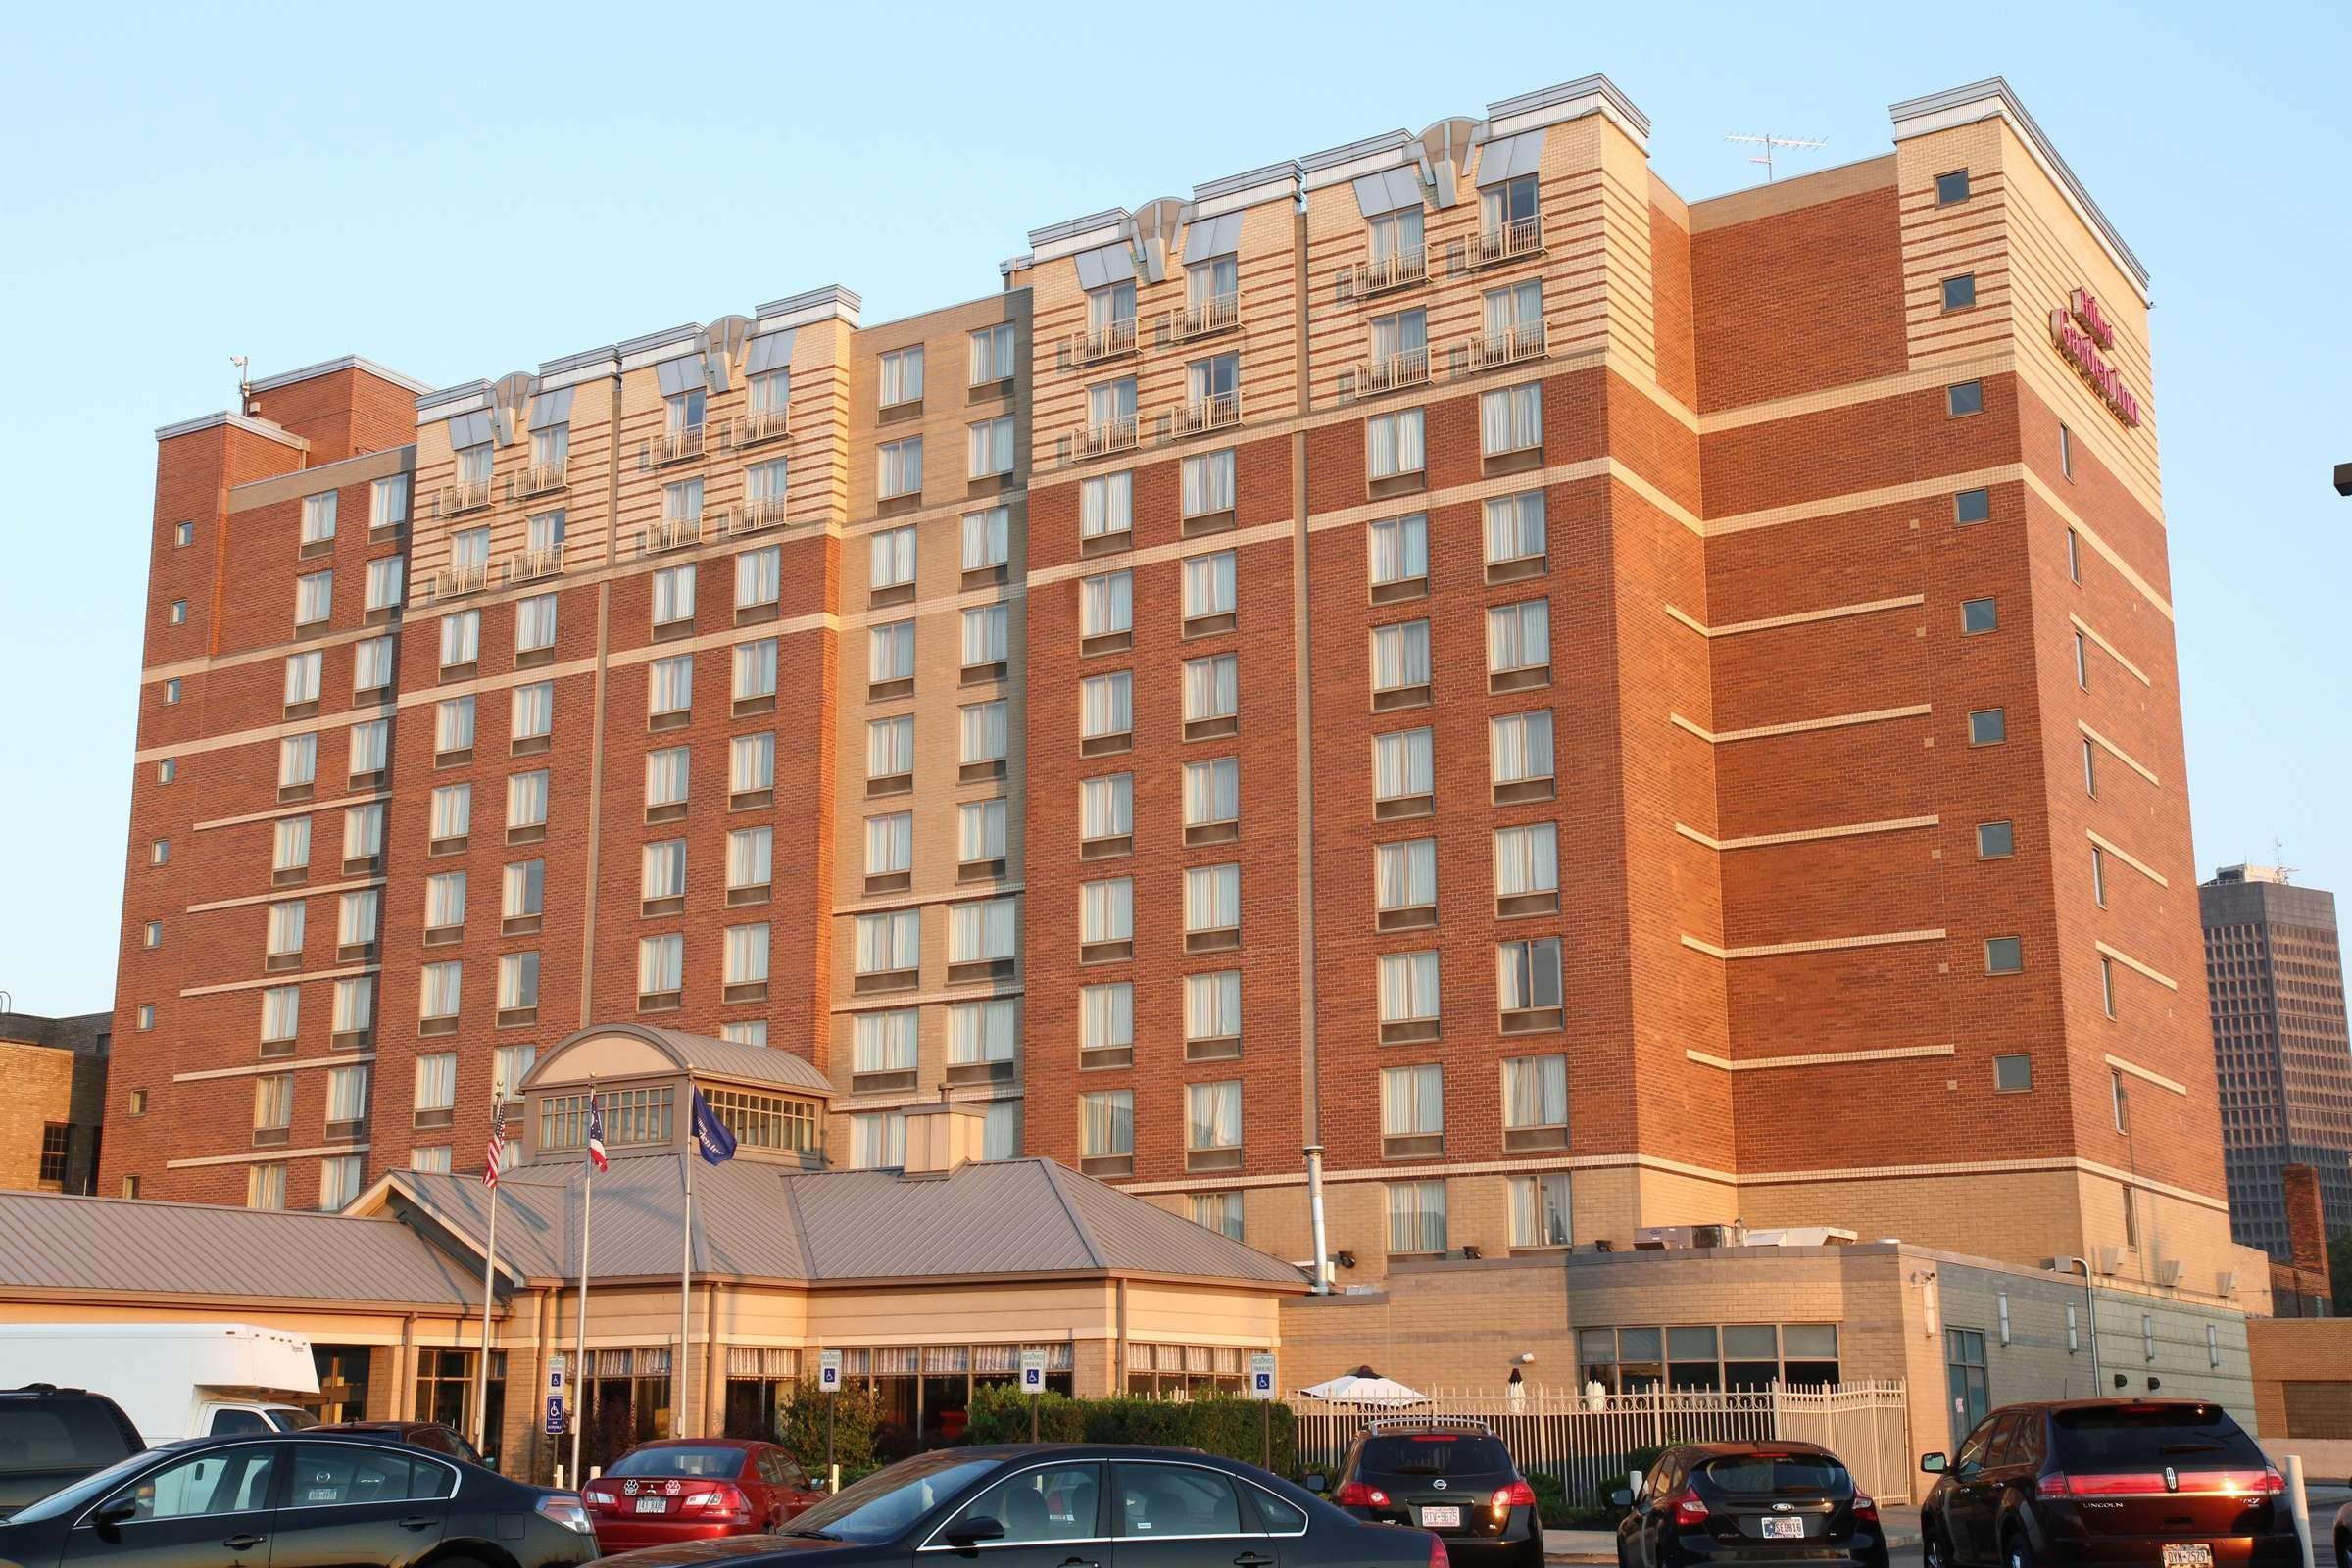 Last Minute Hotel Deals in Cleveland - HotelTonight